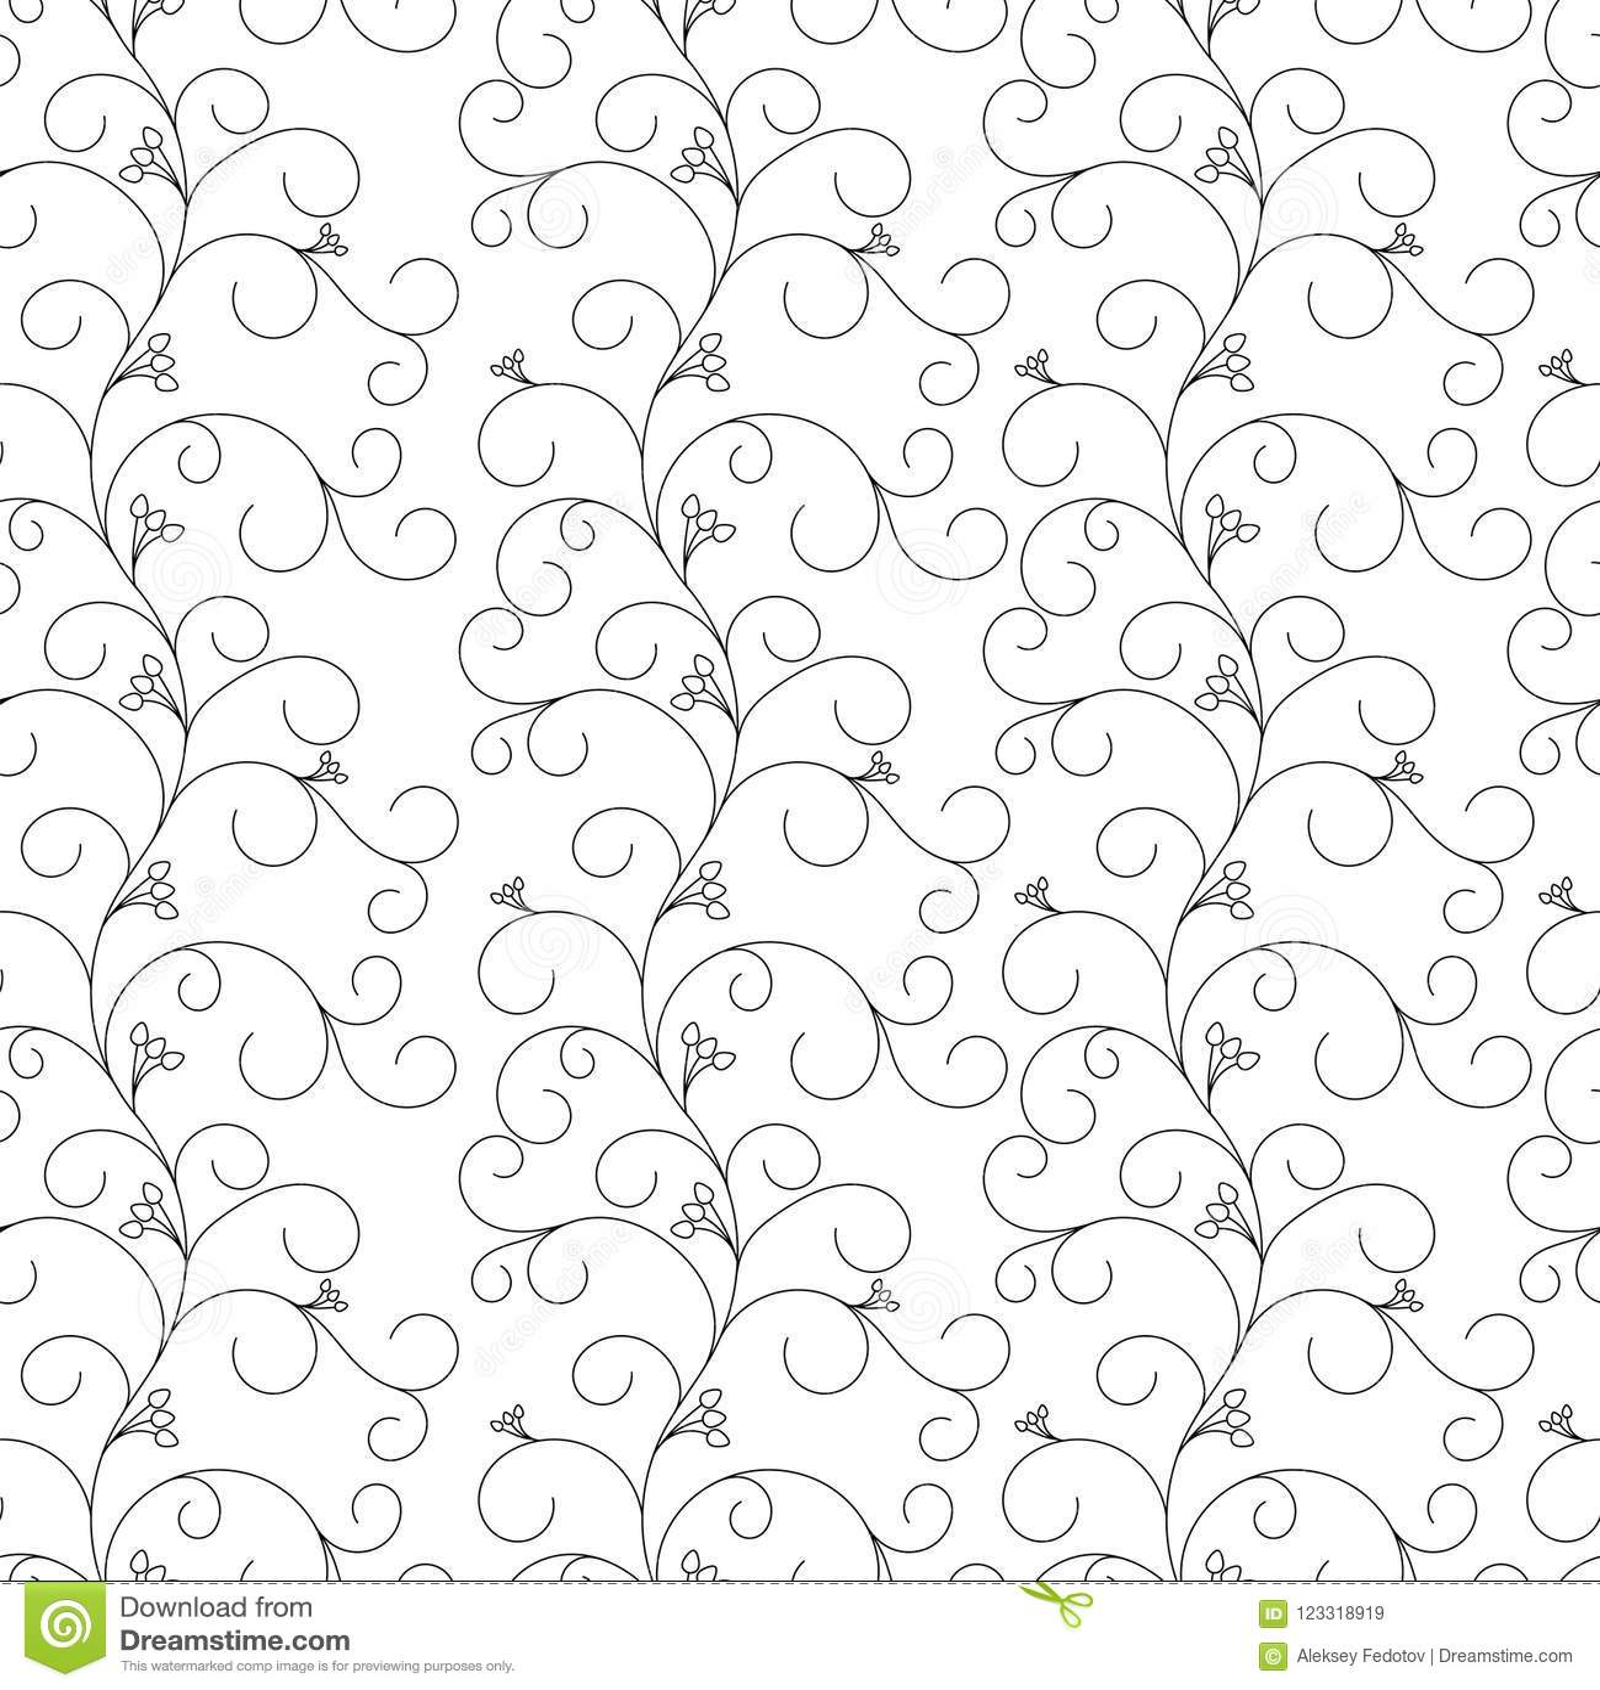 Floral άνευ ραφής σχέδιο, γκρίζες άμπελοι σε ένα άσπρο υπόβαθρο